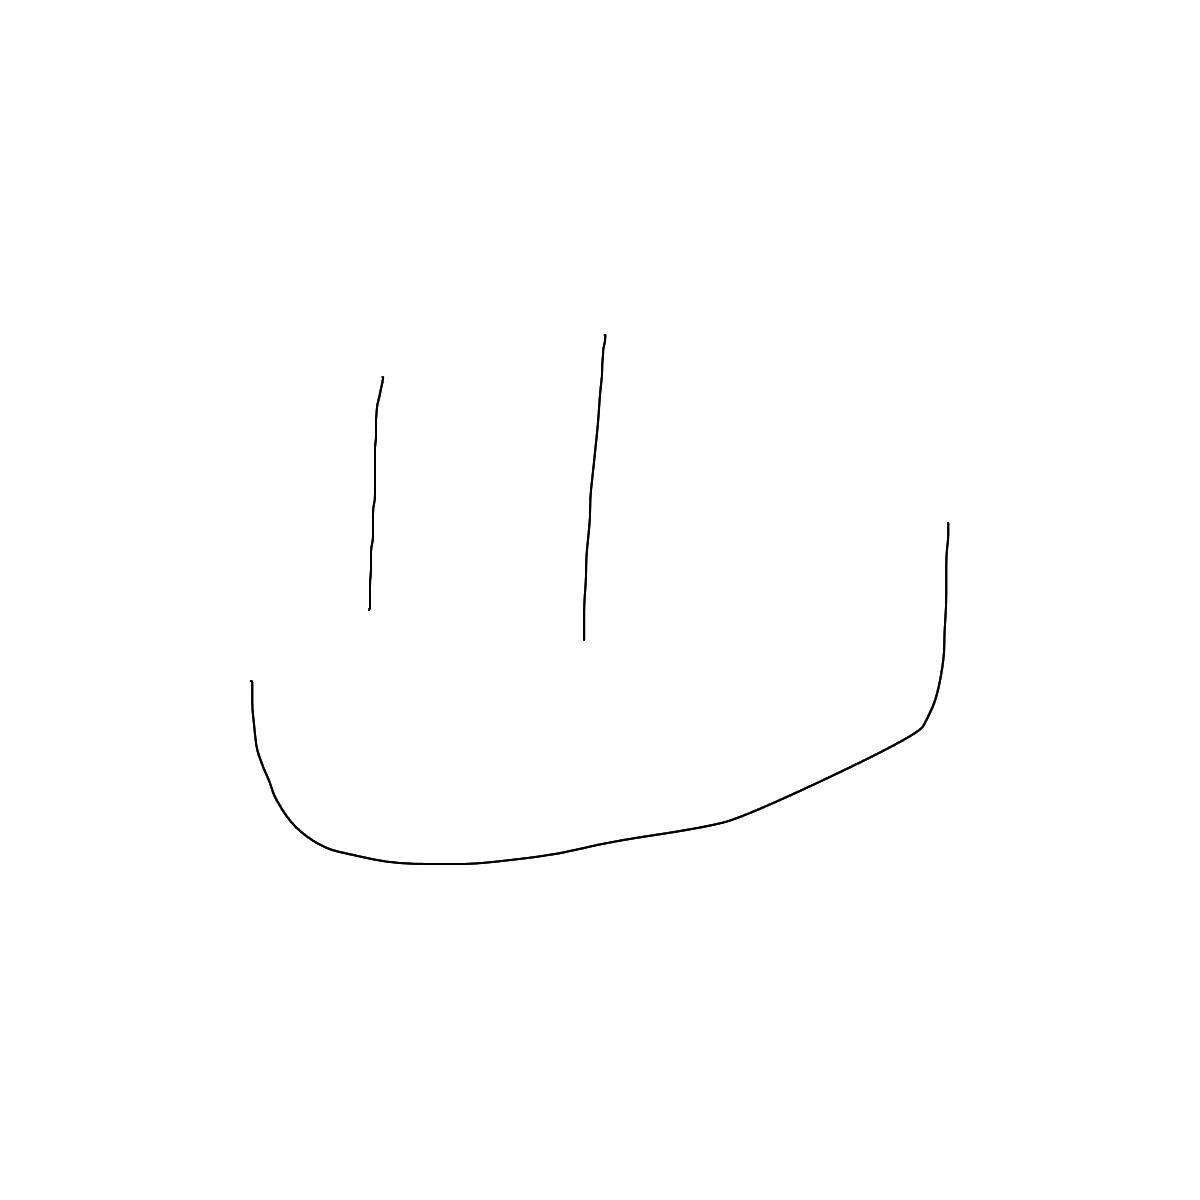 BAAAM drawing#355 lat:-34.9107208251953100lng: -56.1943778991699200